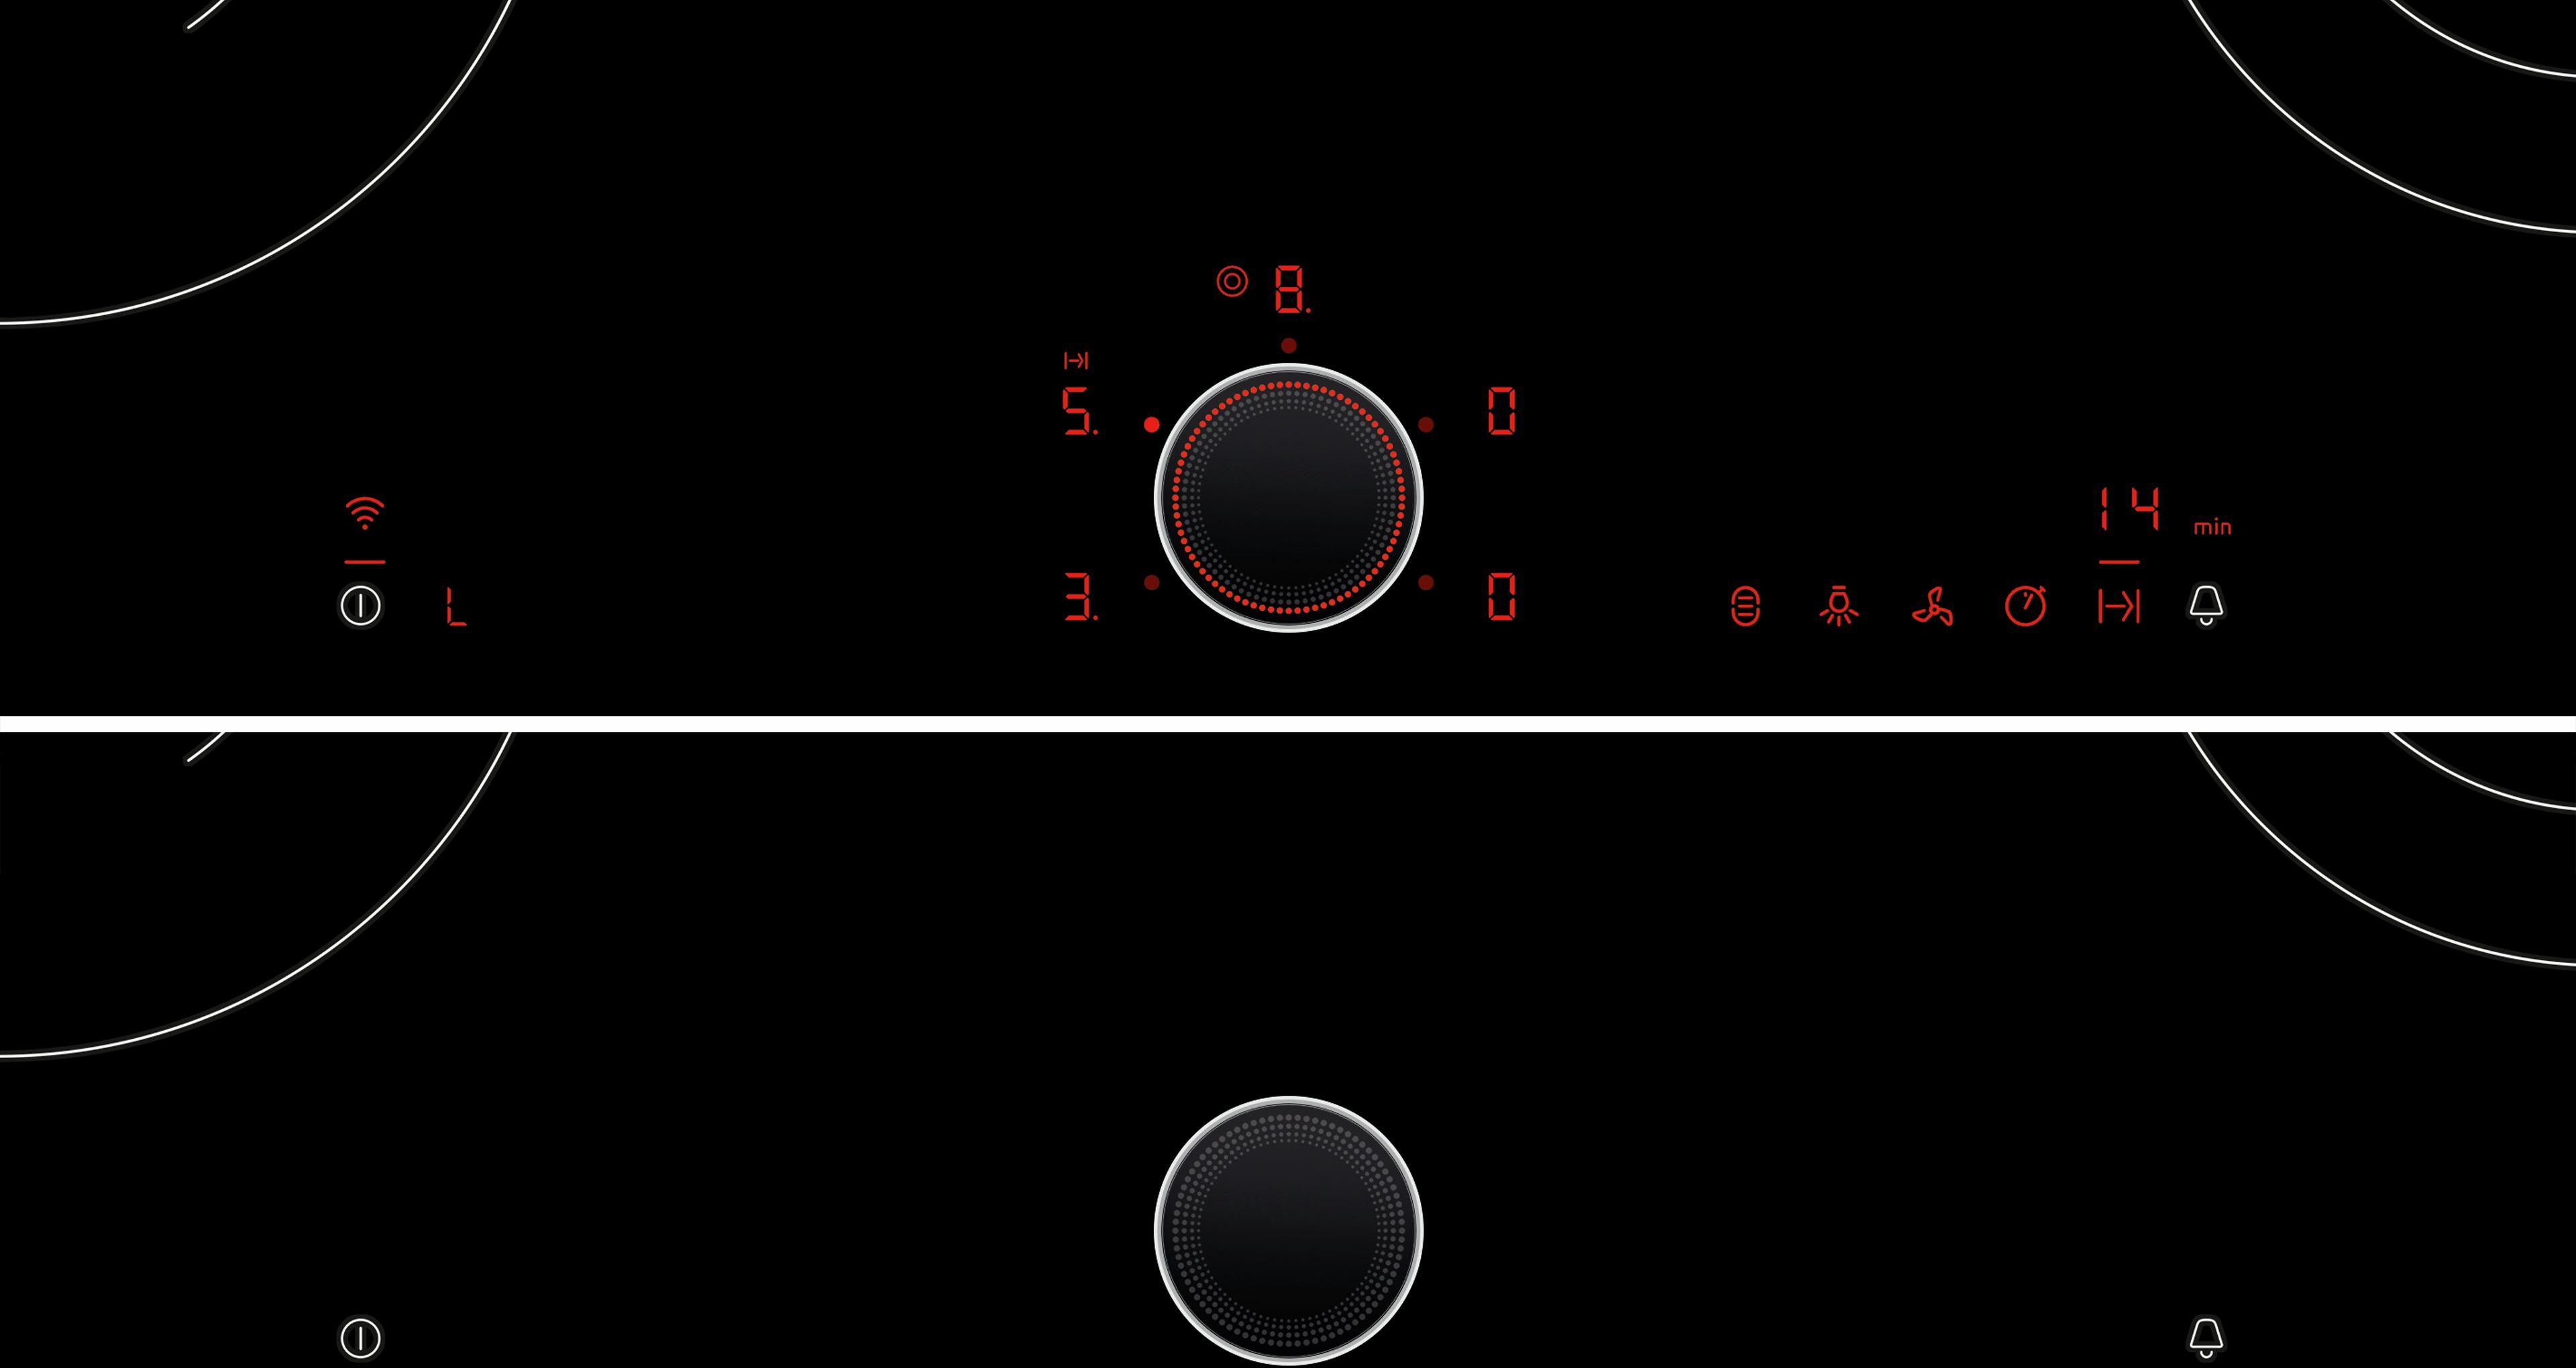 HighSpeed - vitrokeramisch - 80 cm 4 zones (2 dubbele- en 1 combi zone),  timer, TwistPad Fire, HoodControl